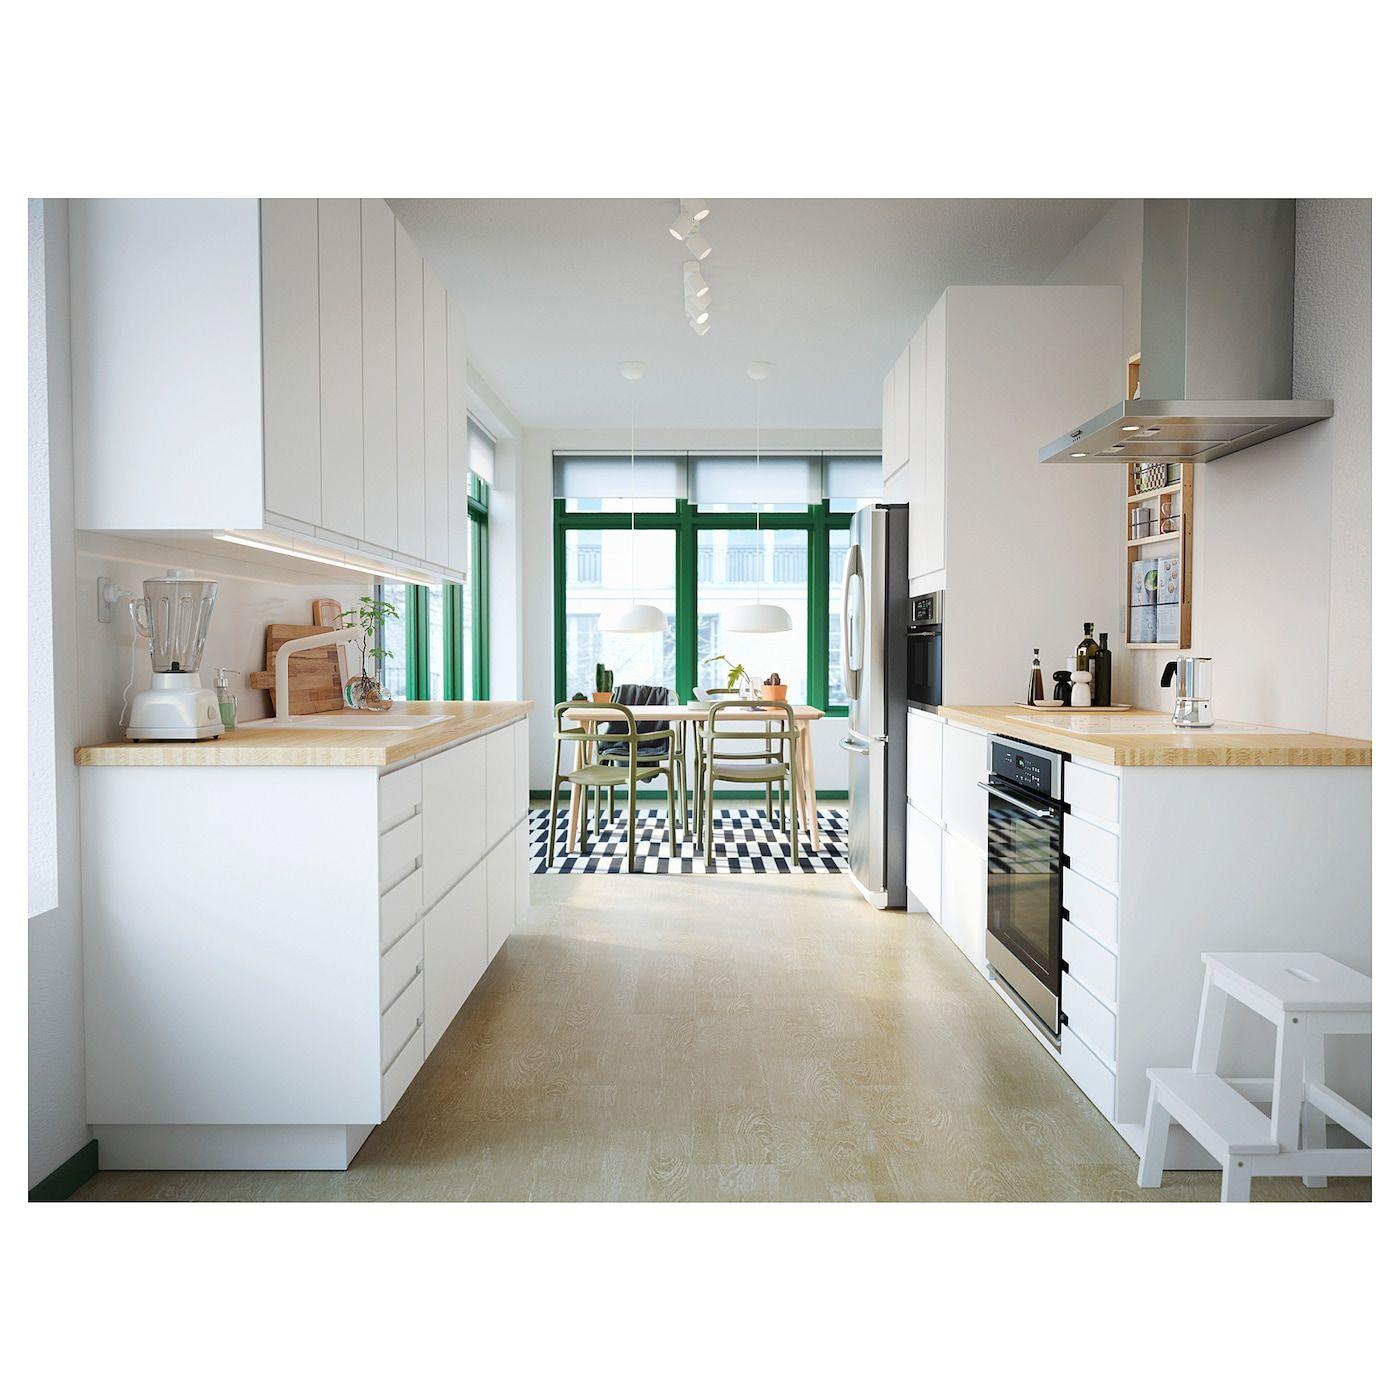 Pinnarp Arbeitsplatte Esche Furnier Ikea Osterreich Countertops Modern Flooring Wood Countertops